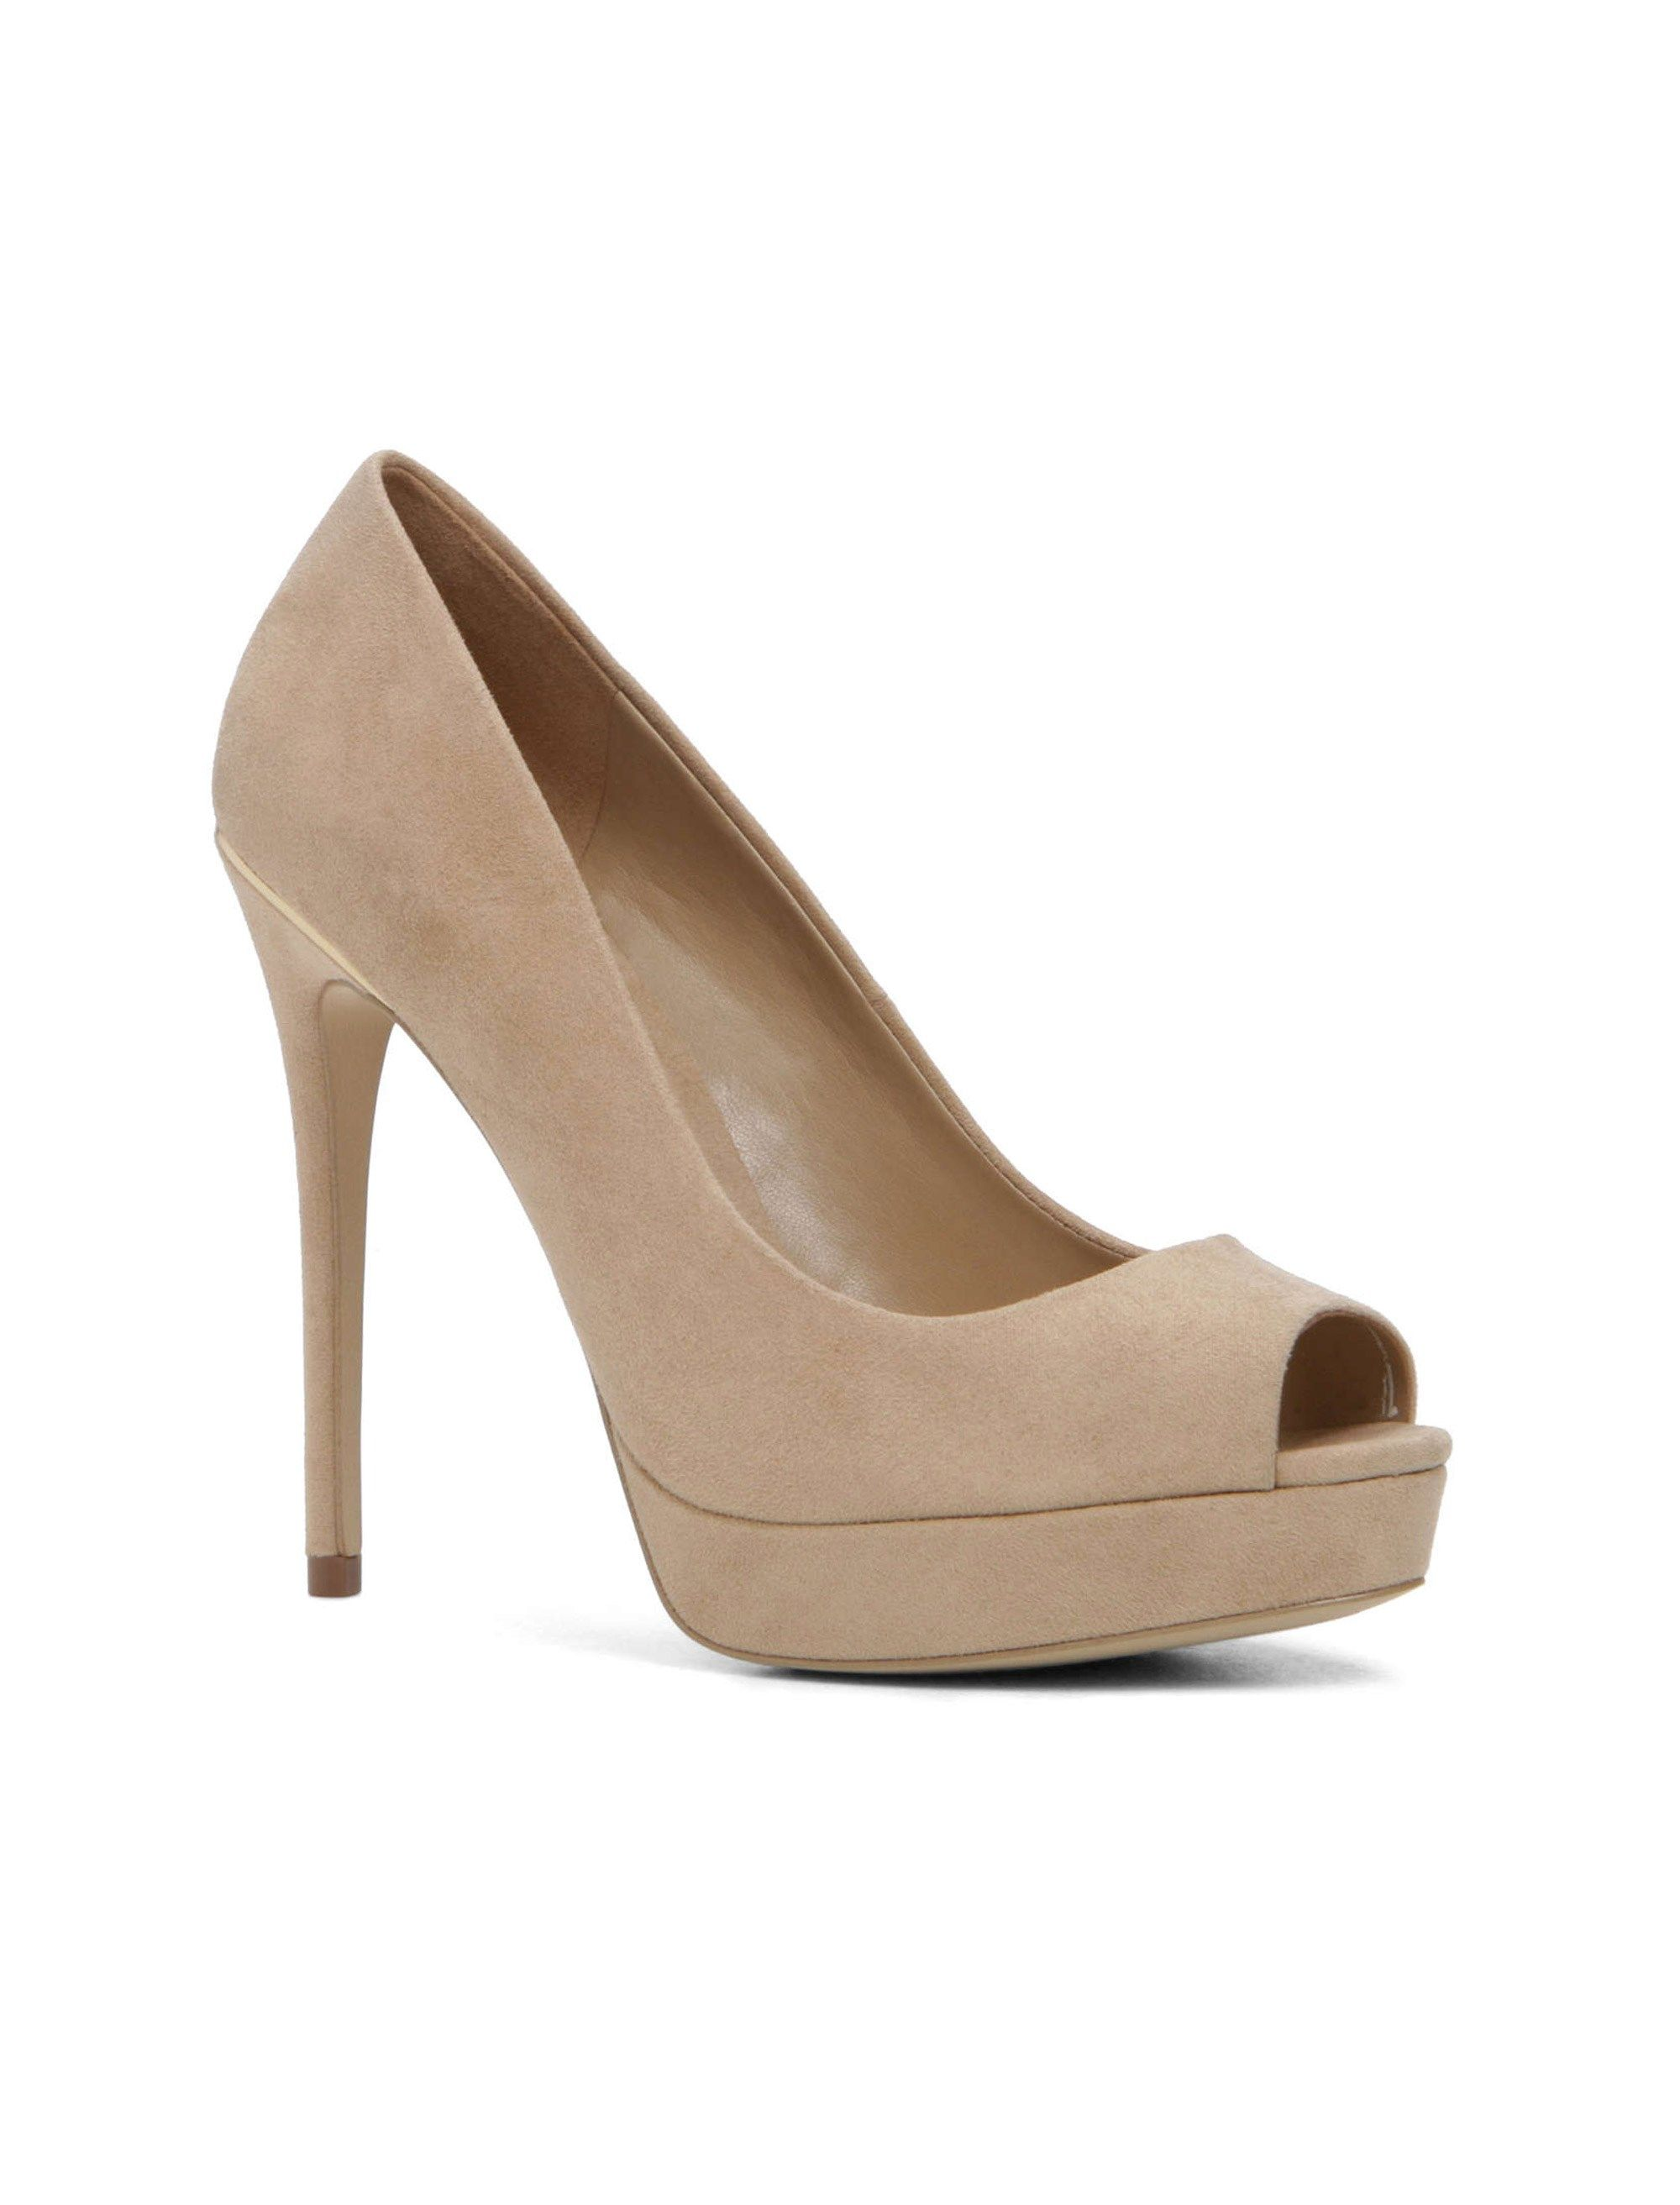 d02494ea4f54 خرید کفش پاشنه بلند زنانه آلدو